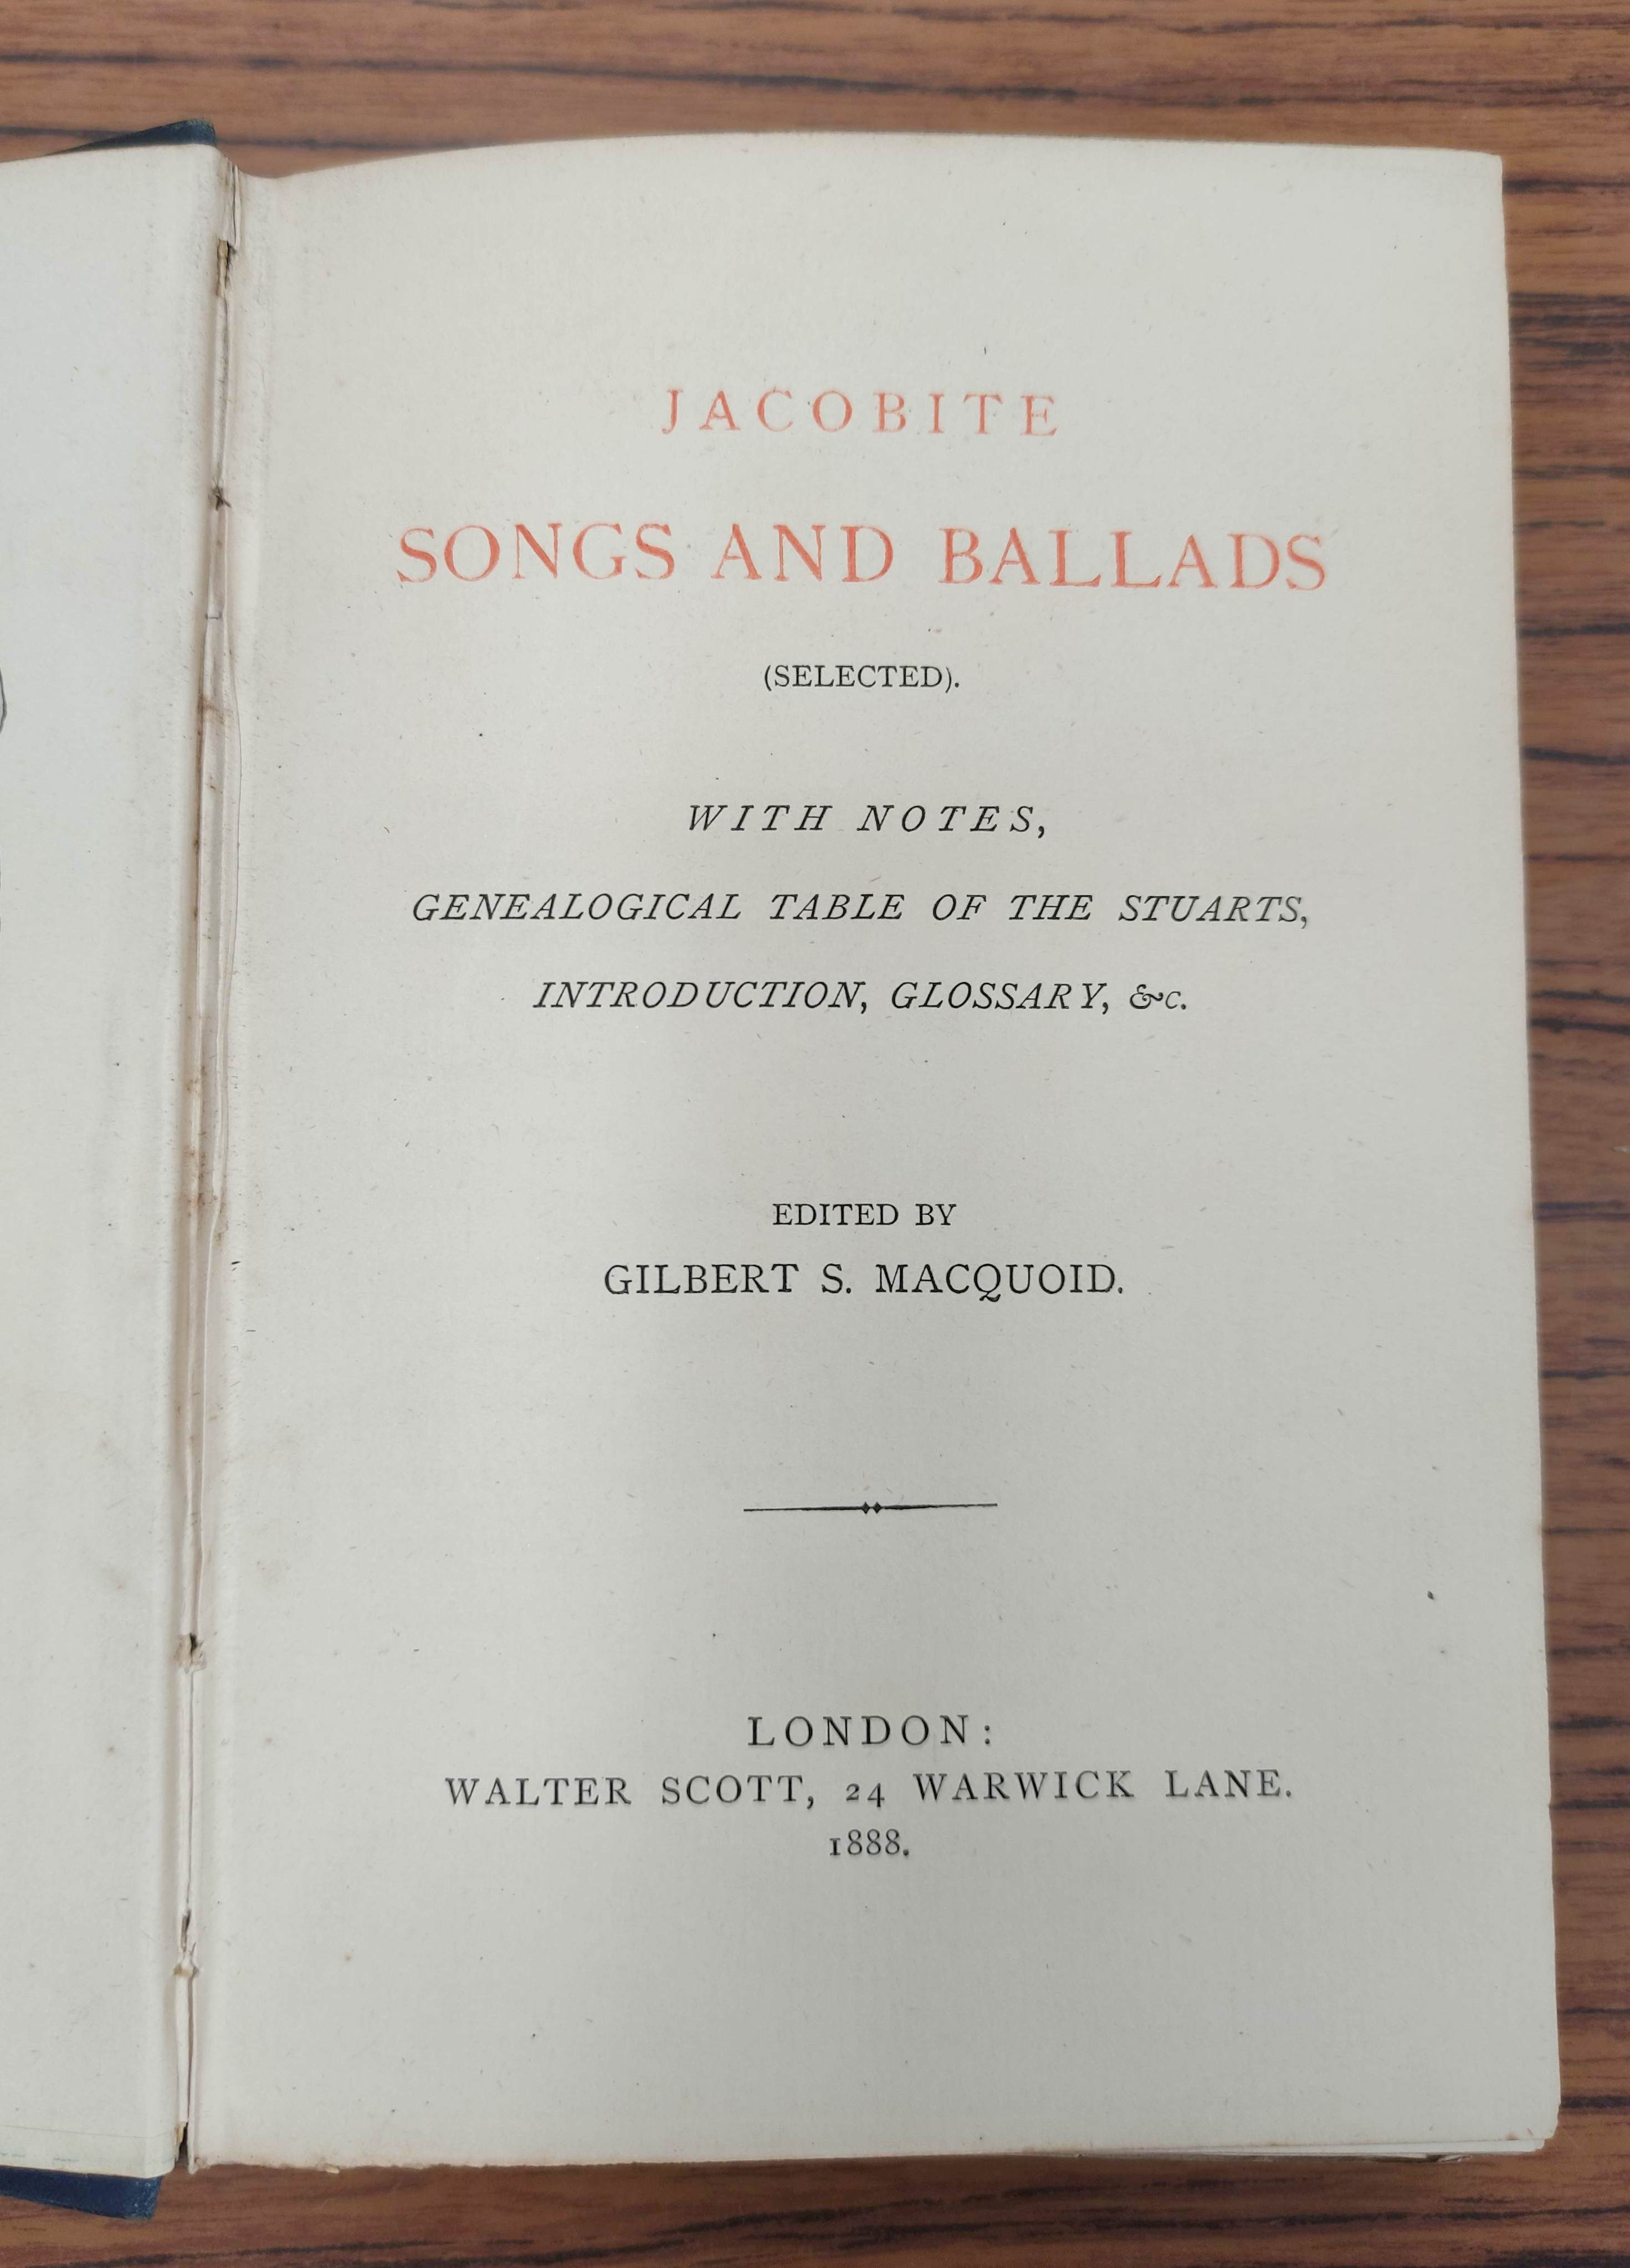 POGANY WILLY (Illus).Rubaiyat of Omar Khayyam. Col. & other plates. Maroon morocco gilt, adhesions - Image 8 of 11